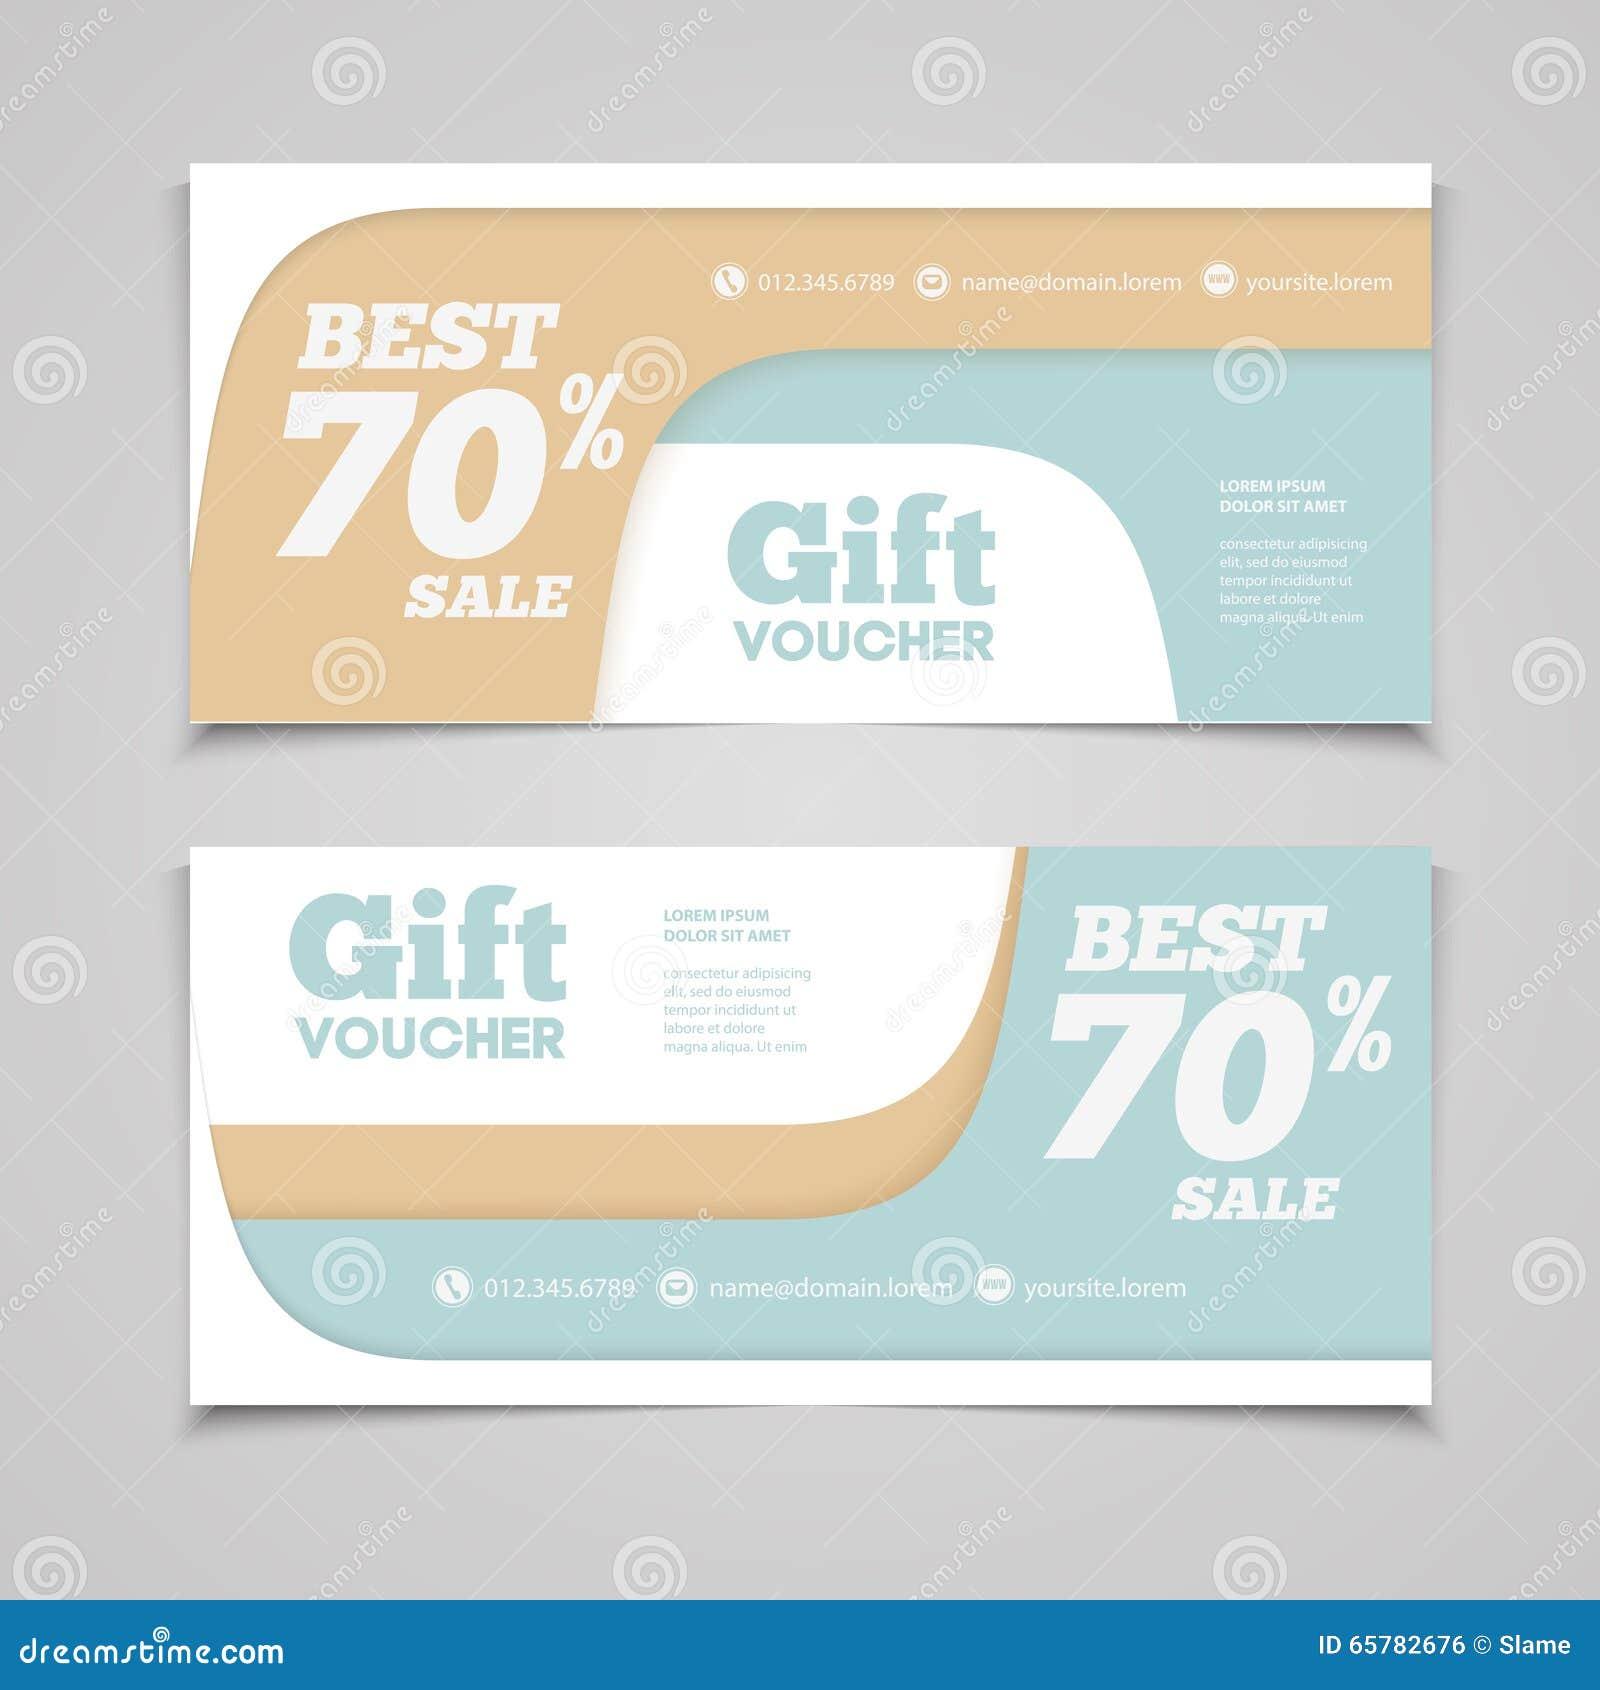 Bbc shop discount coupon